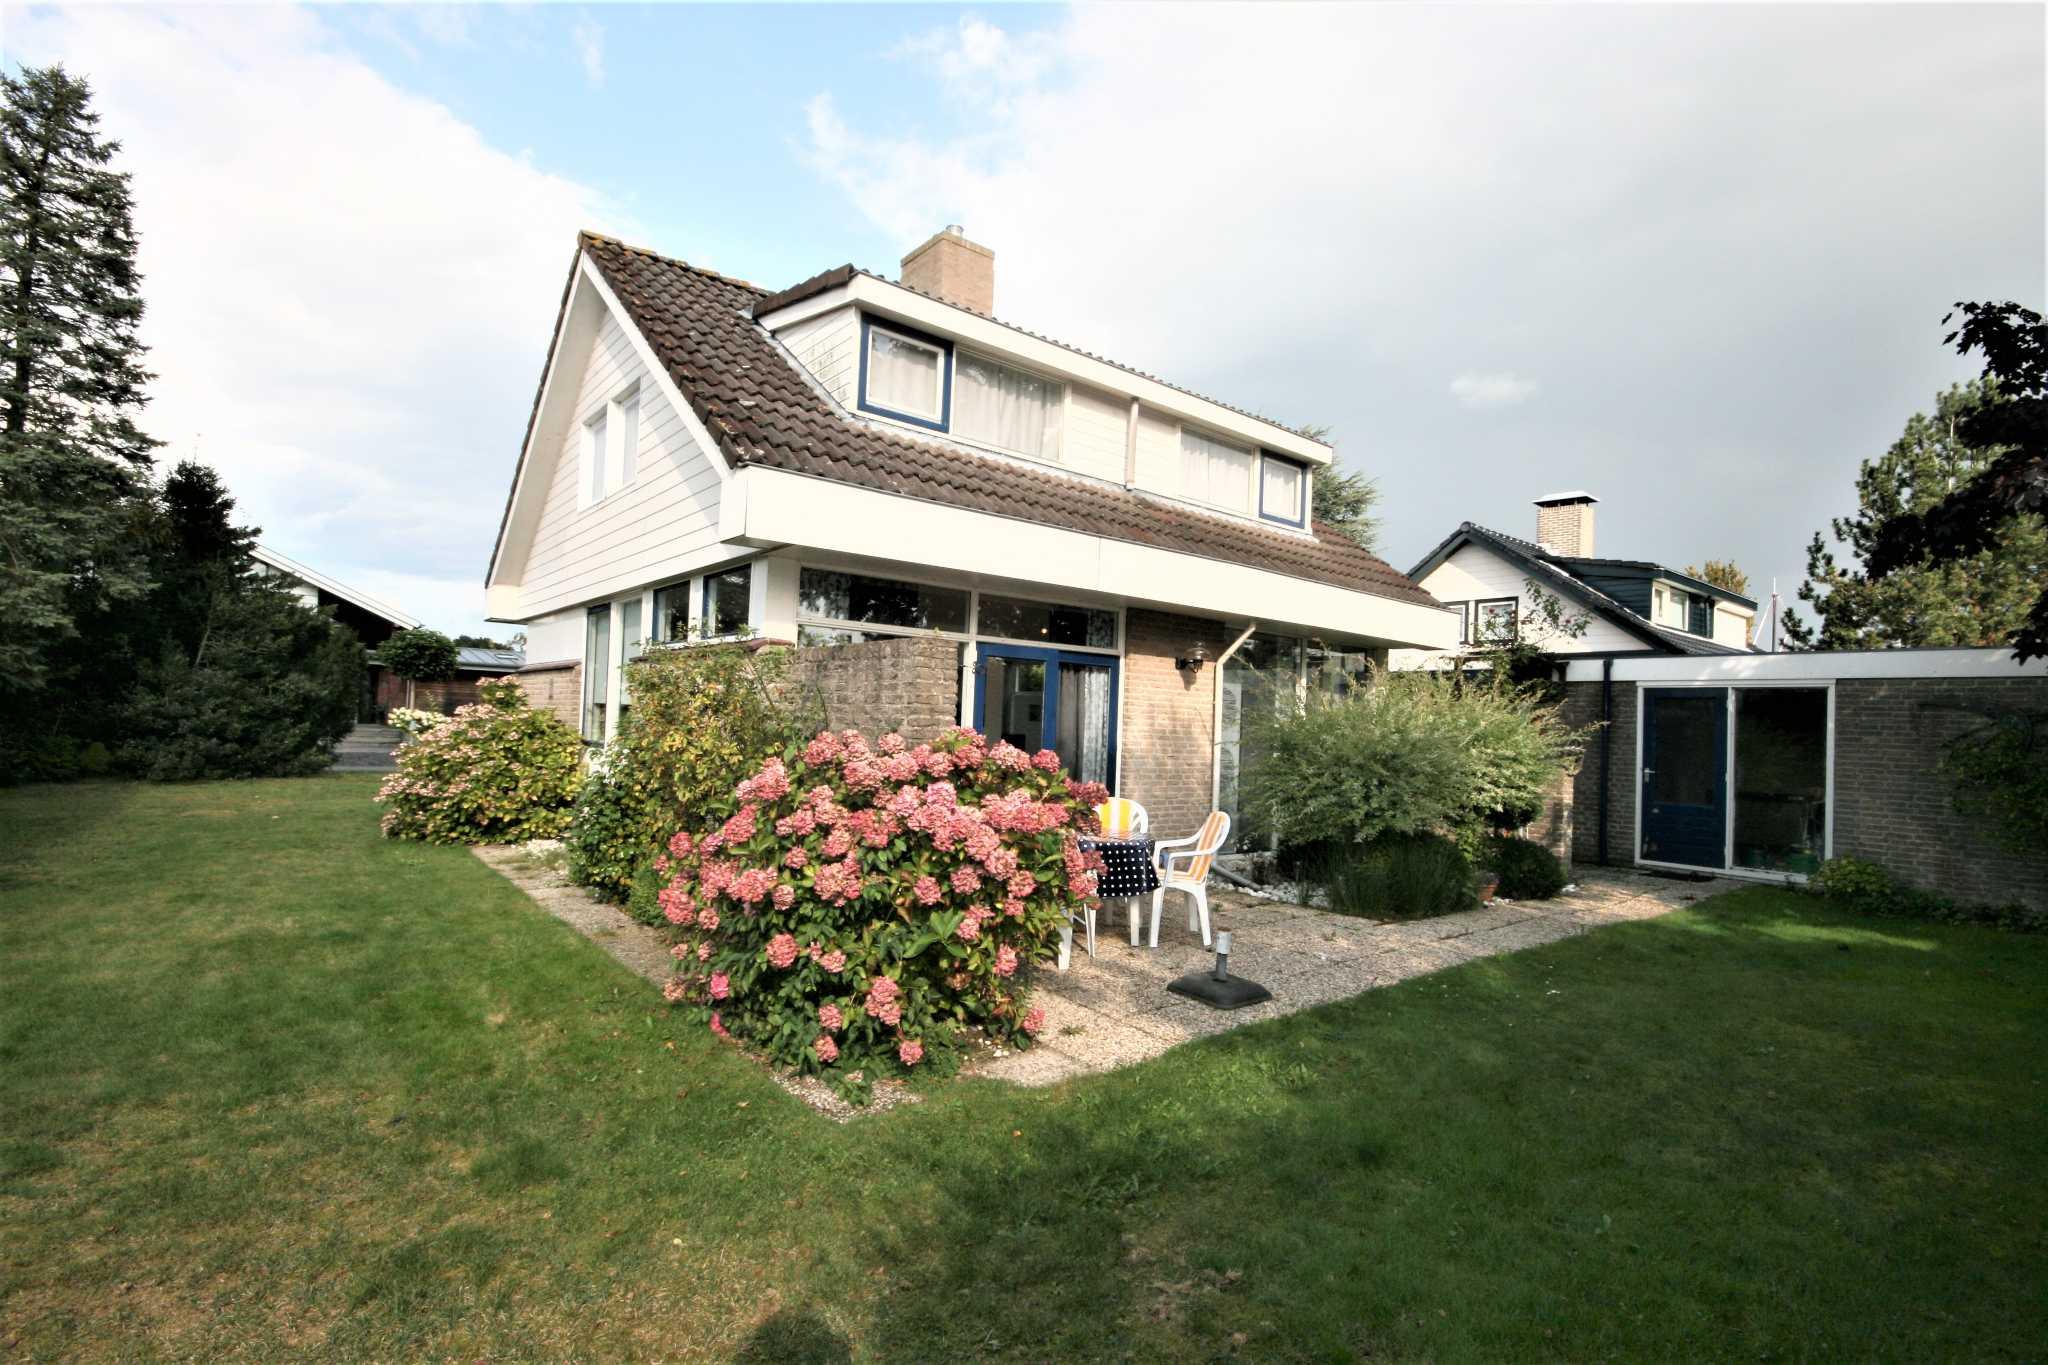 freistehendes familienhaus in lemmer friesland nina goudberg. Black Bedroom Furniture Sets. Home Design Ideas